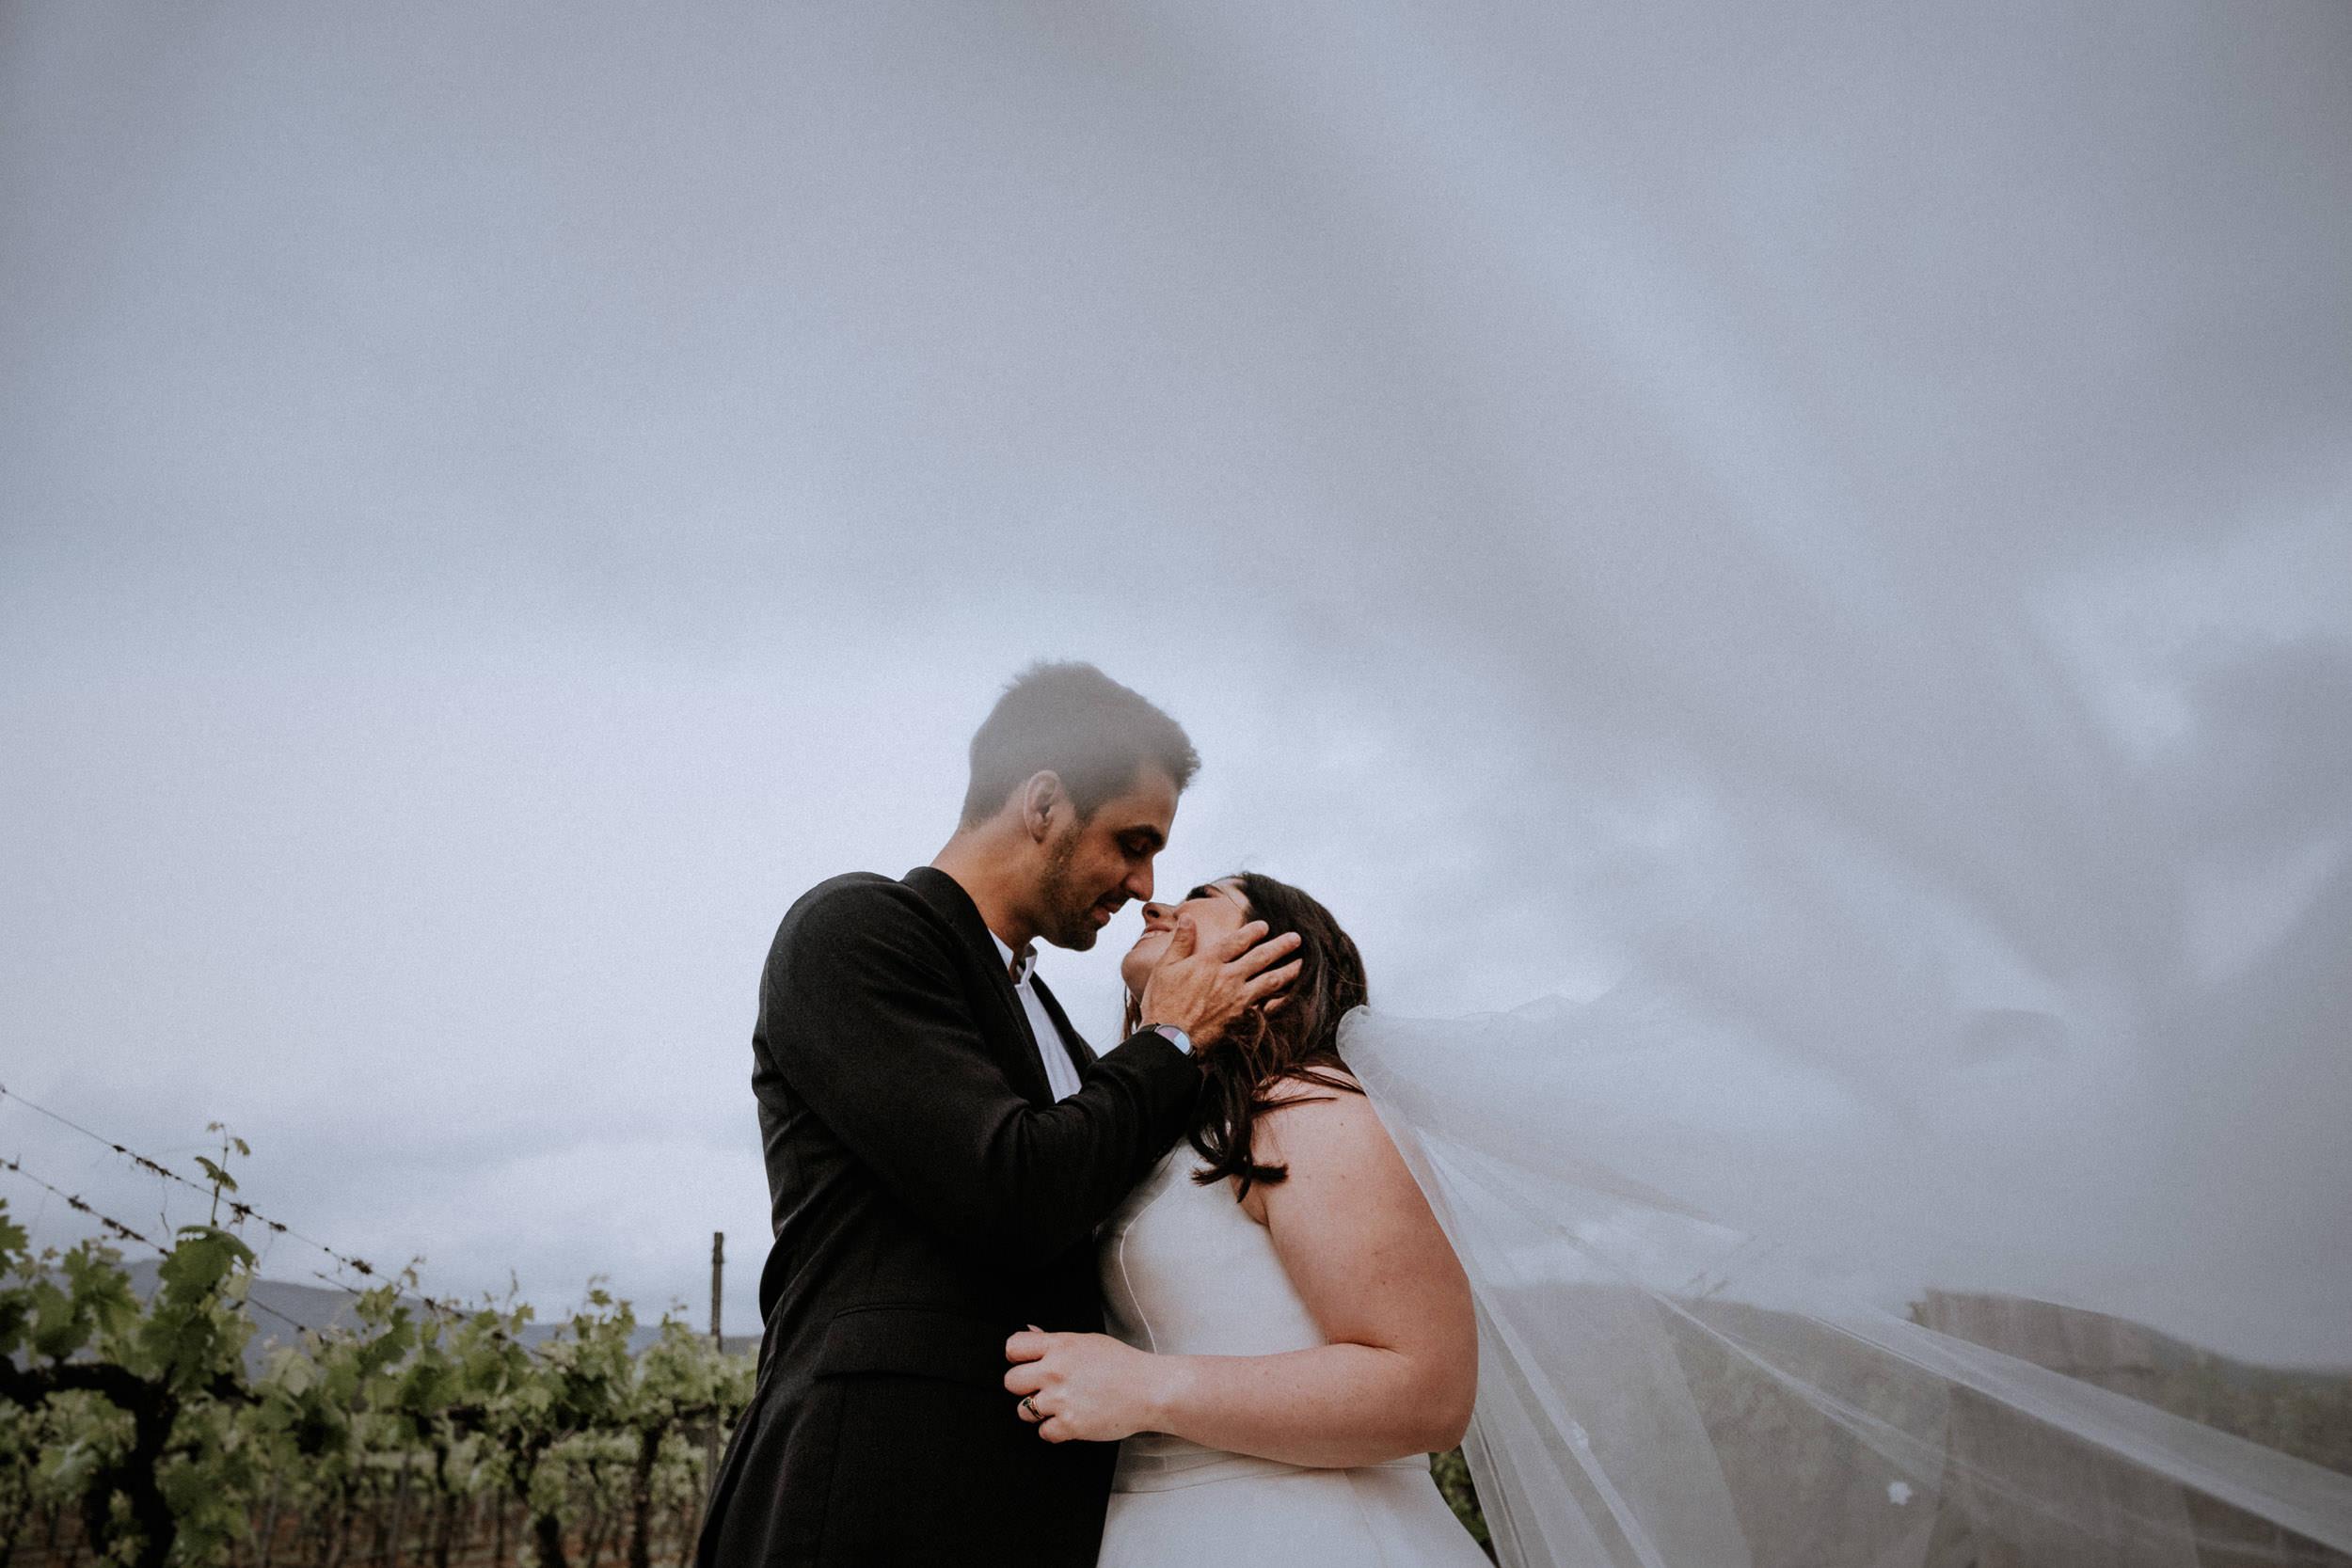 s+j_top_elopement wedding photography_kings & thieves_blog - 446.jpg